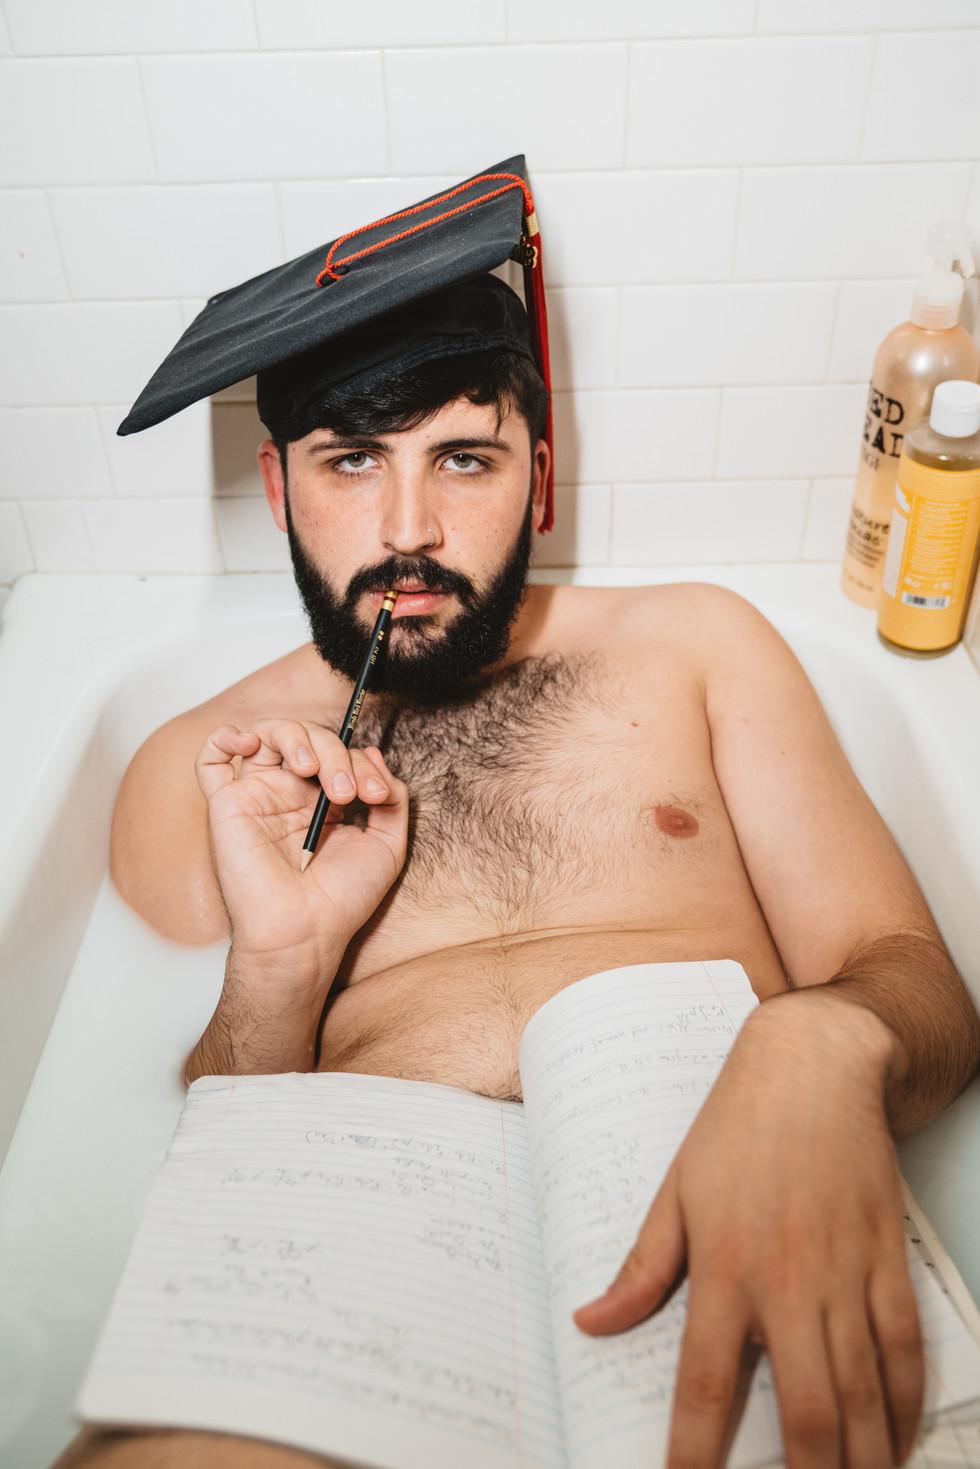 College Student in Bathtub | Portrait/Fashion Photography | Chromatone Studios